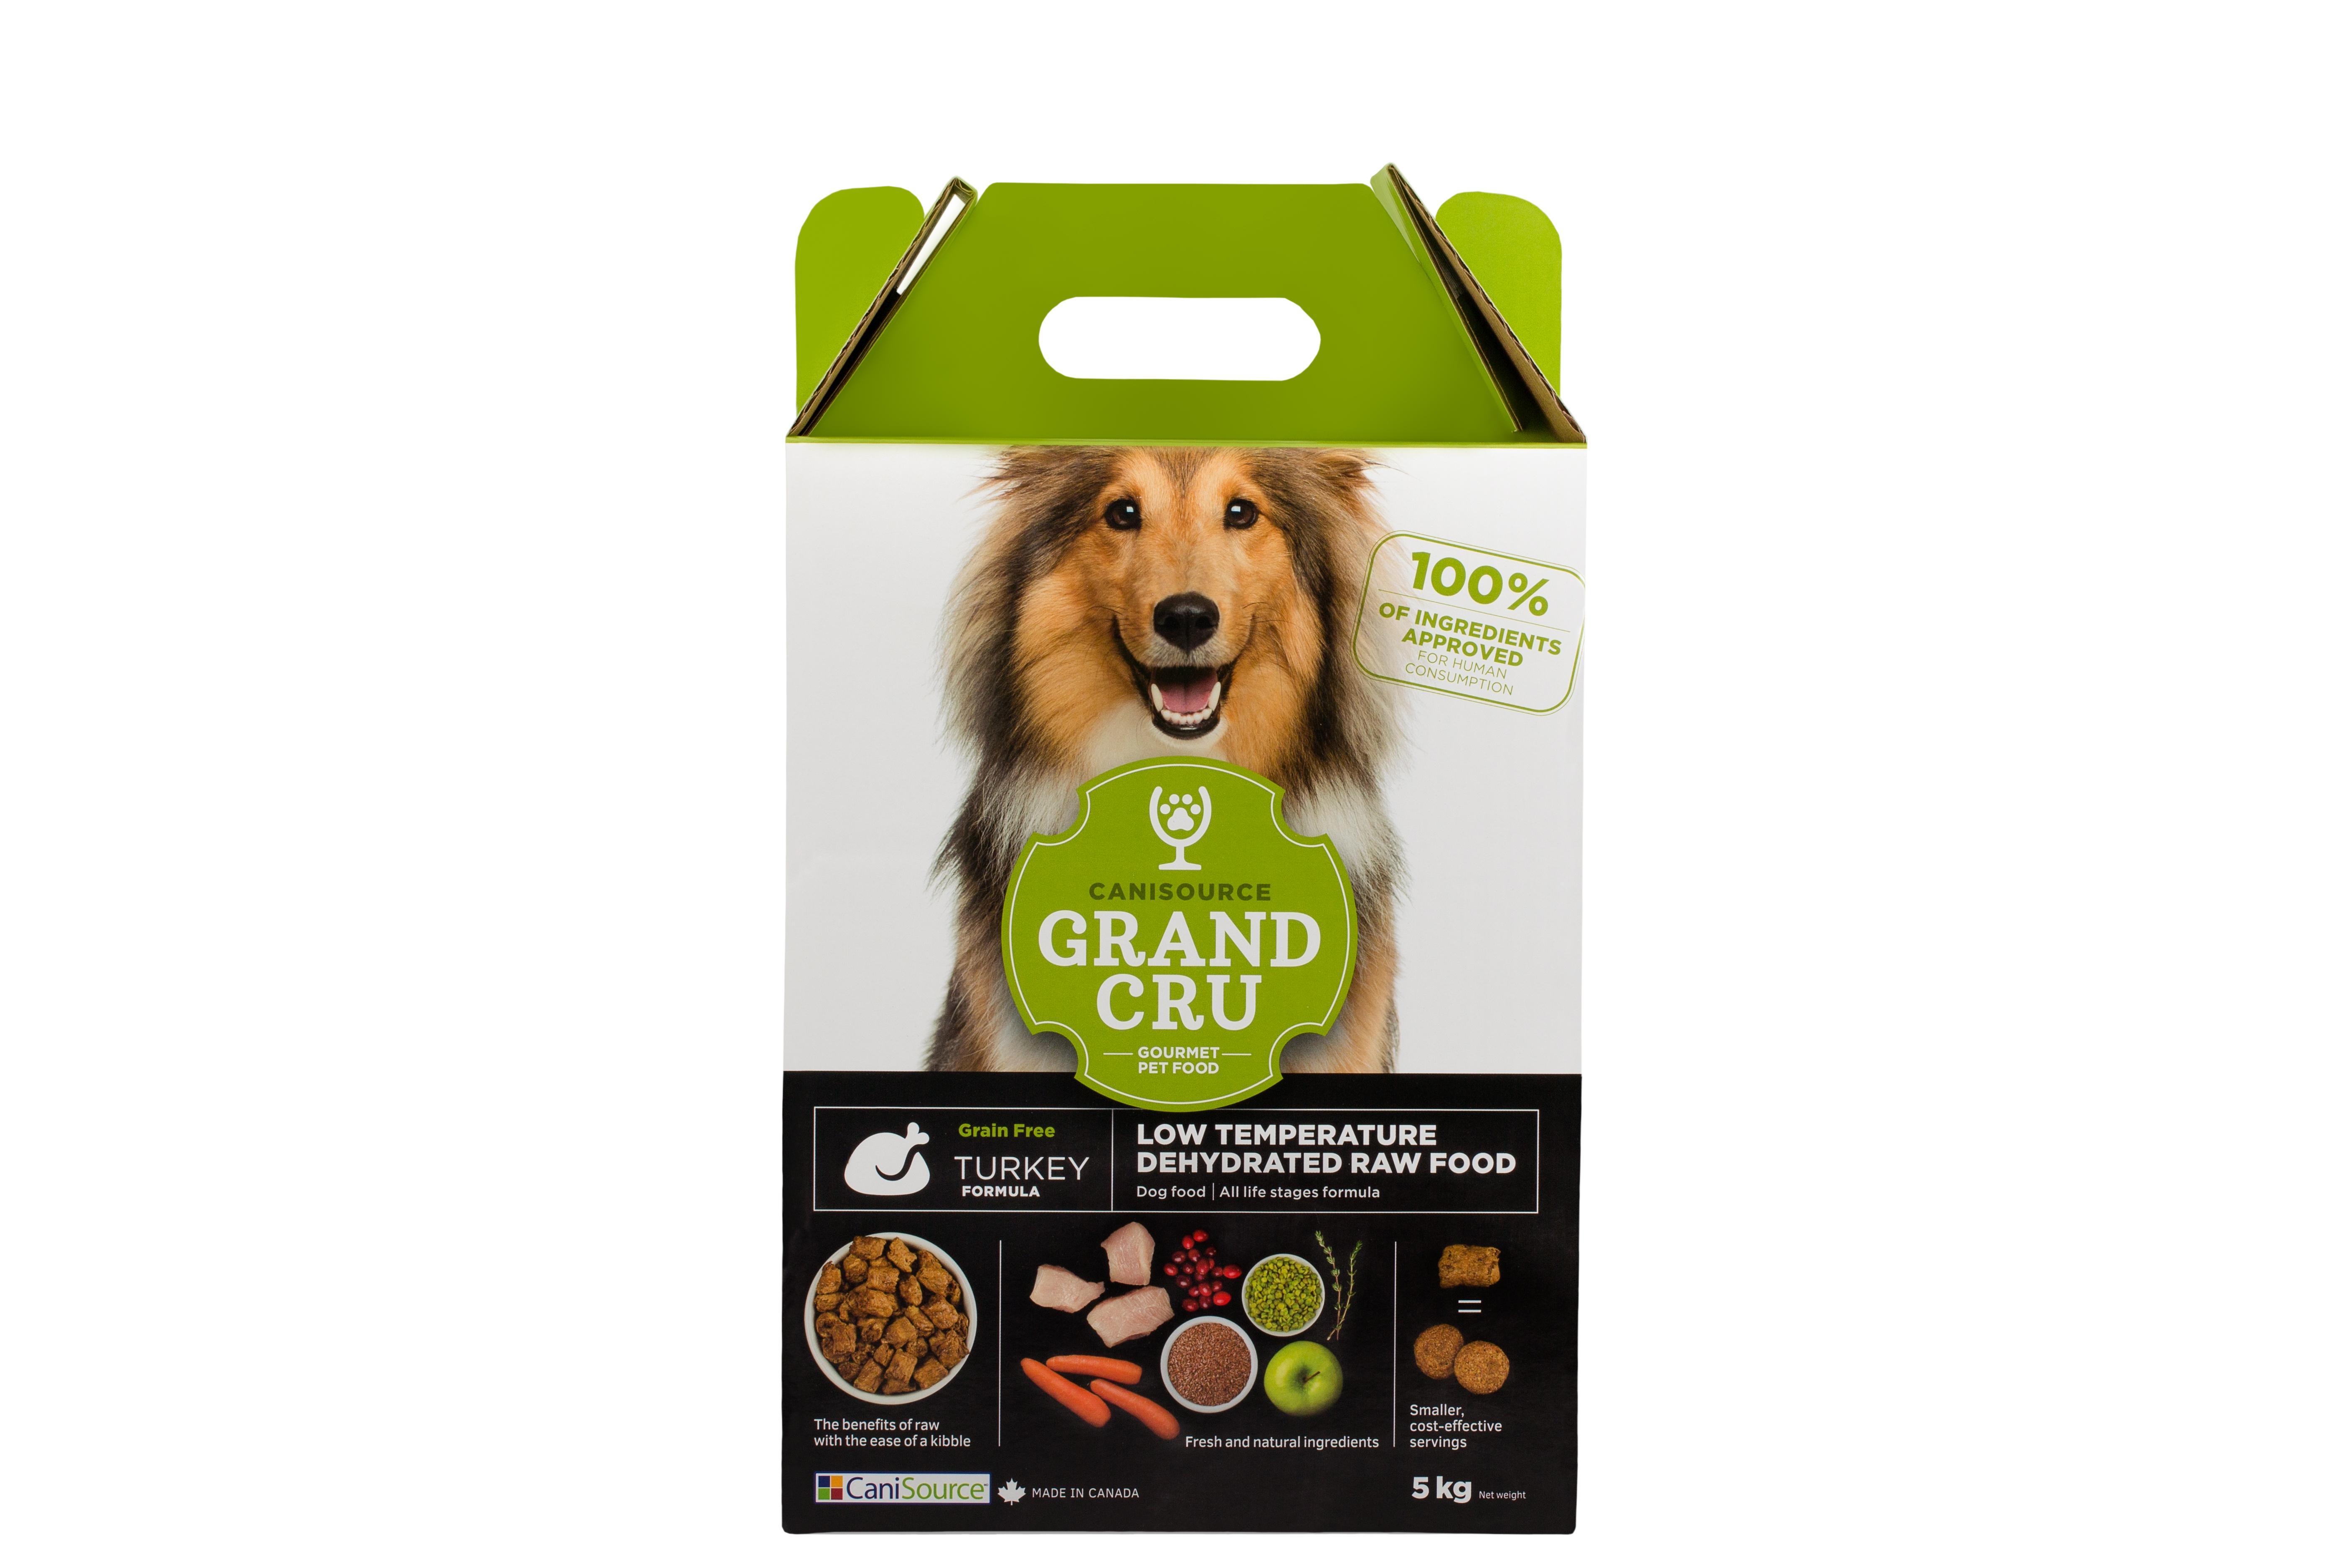 CaniSource Grand Cru Turkey Formula Grain-Free Dehydrated Dog Food, 5-kg